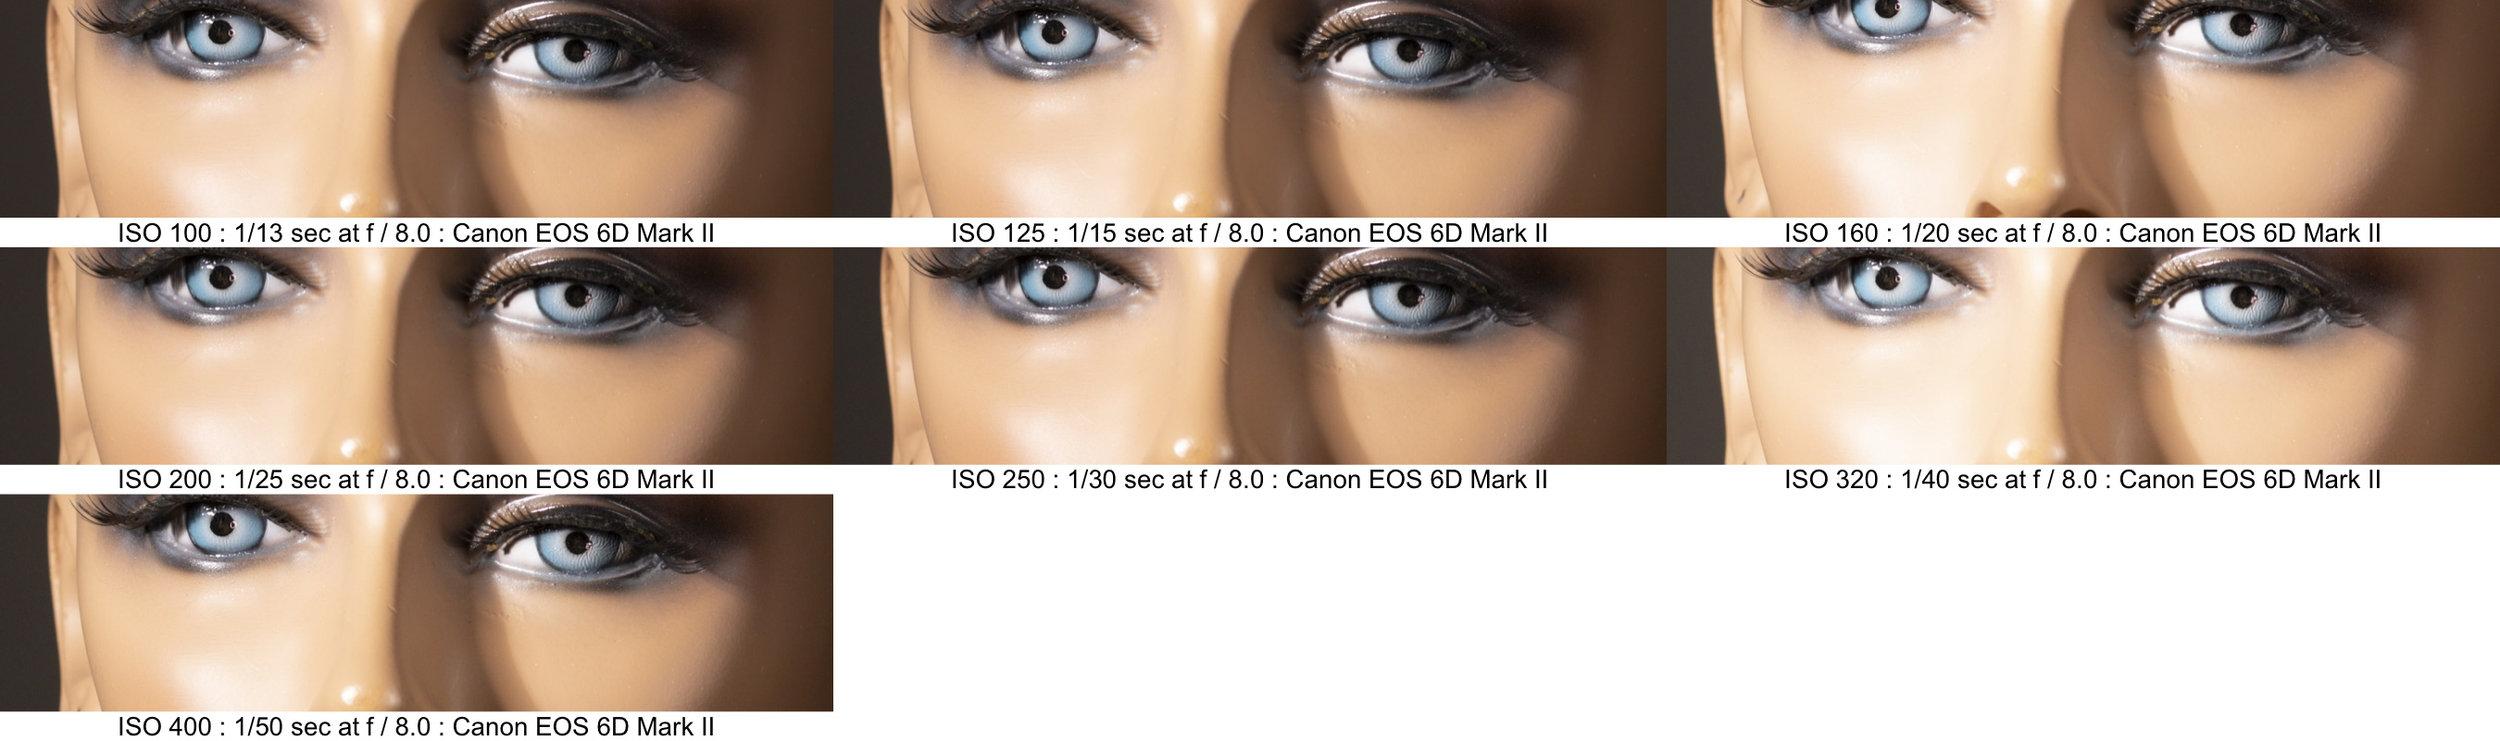 iso-compare-exposure.jpg